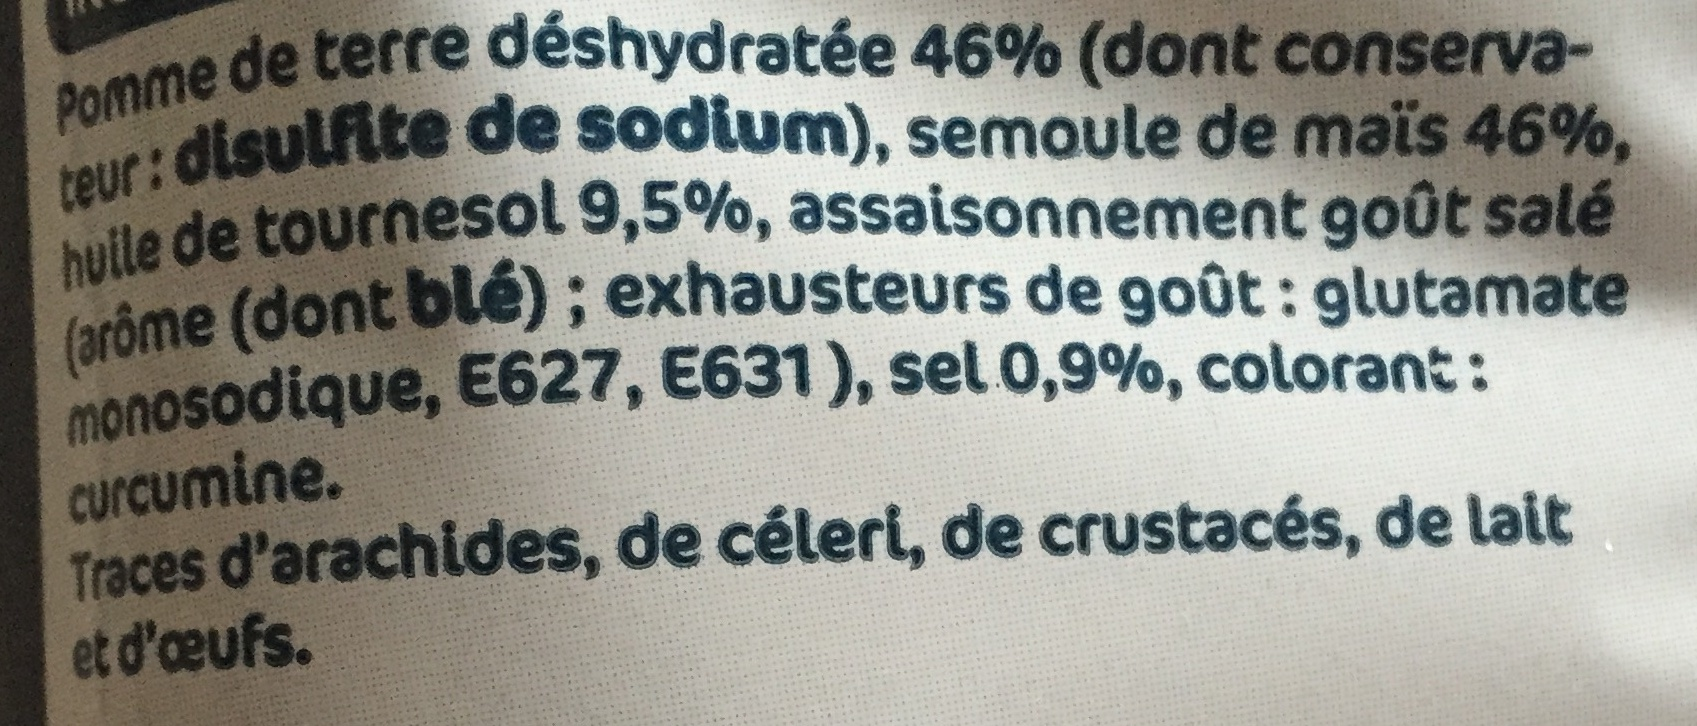 Frites goût salé - Ingrédients - fr